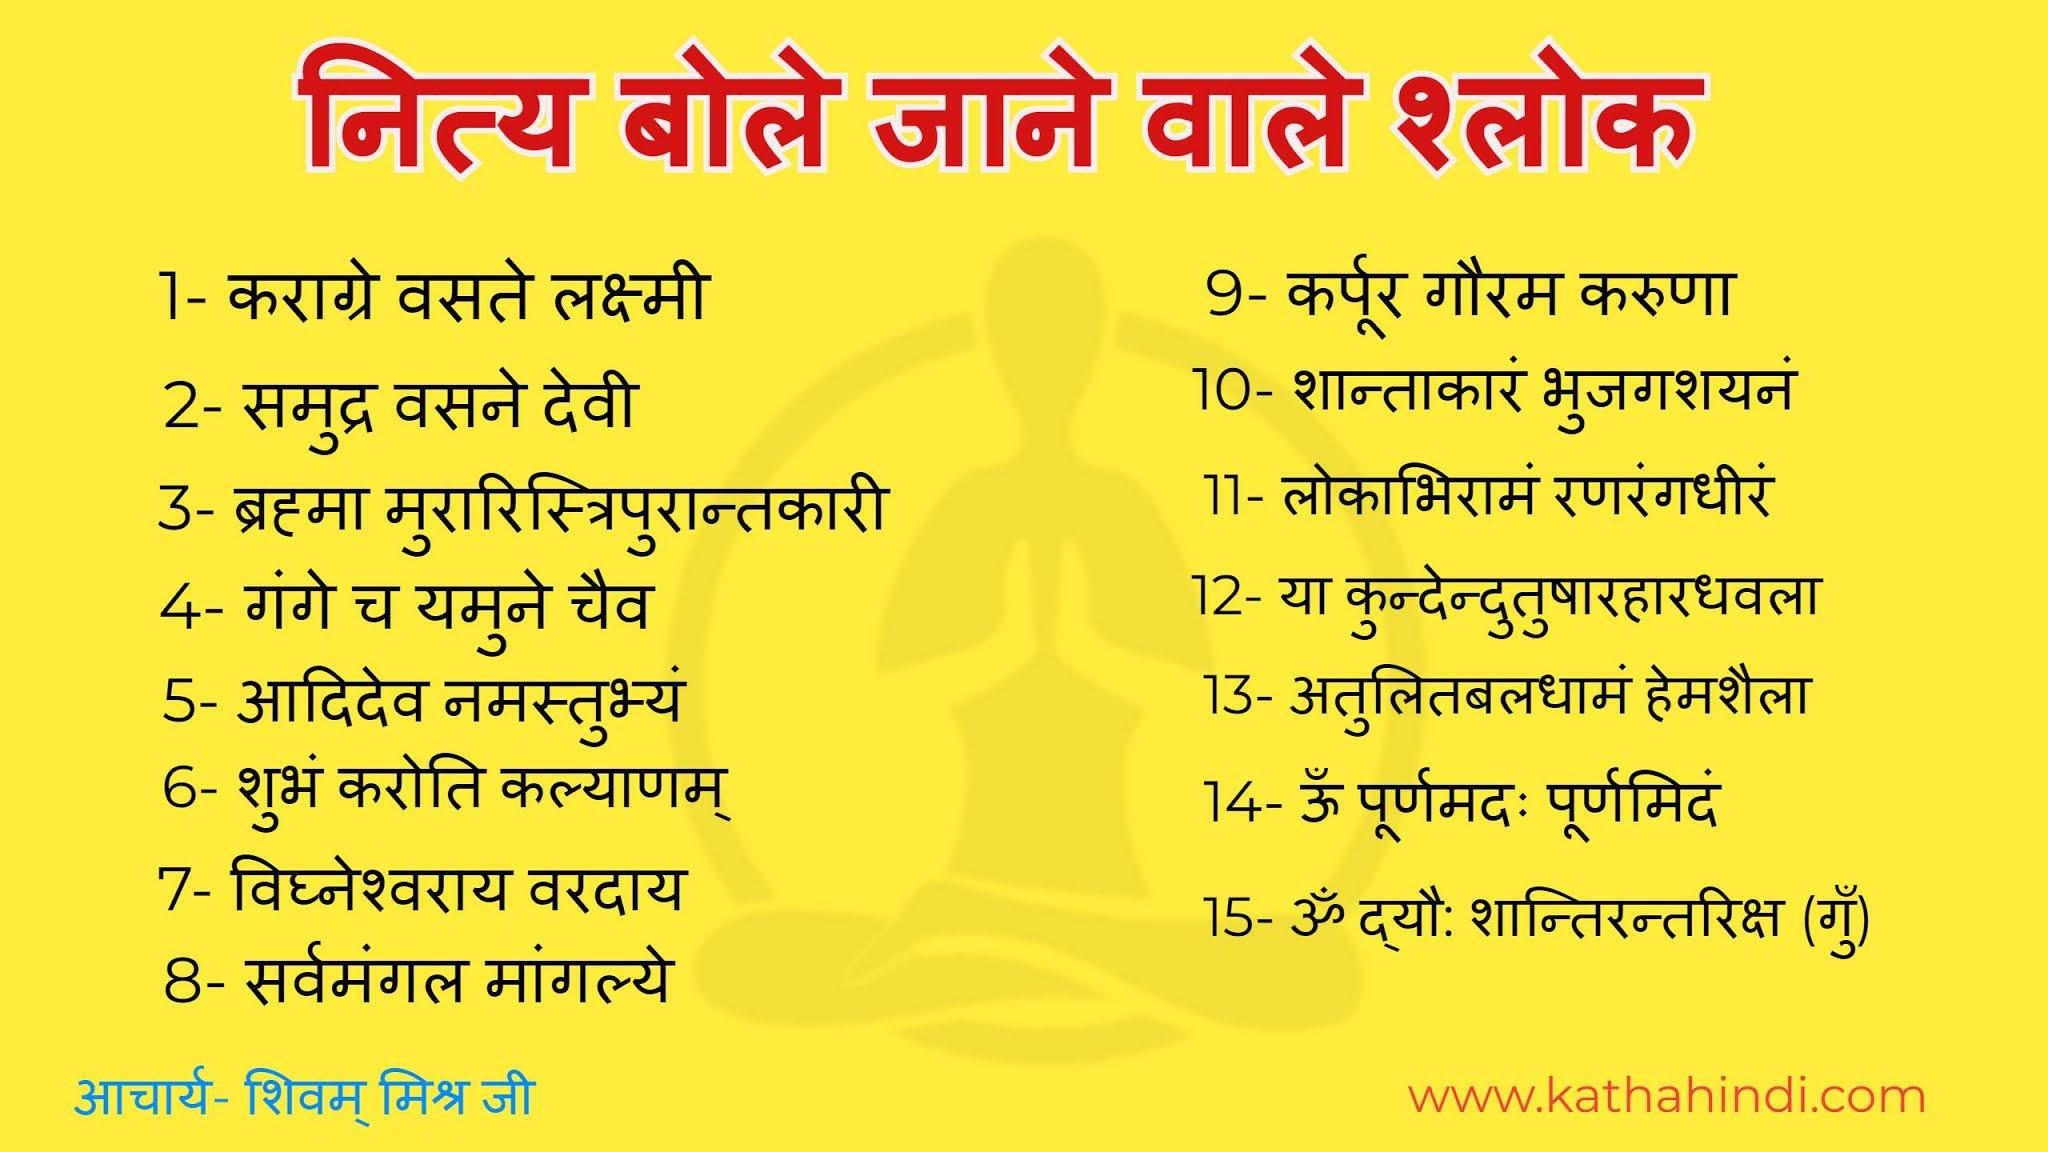 Pratah Smaran Mantra in Sanskrit / नित्य प्रातः स्मरण श्लोक